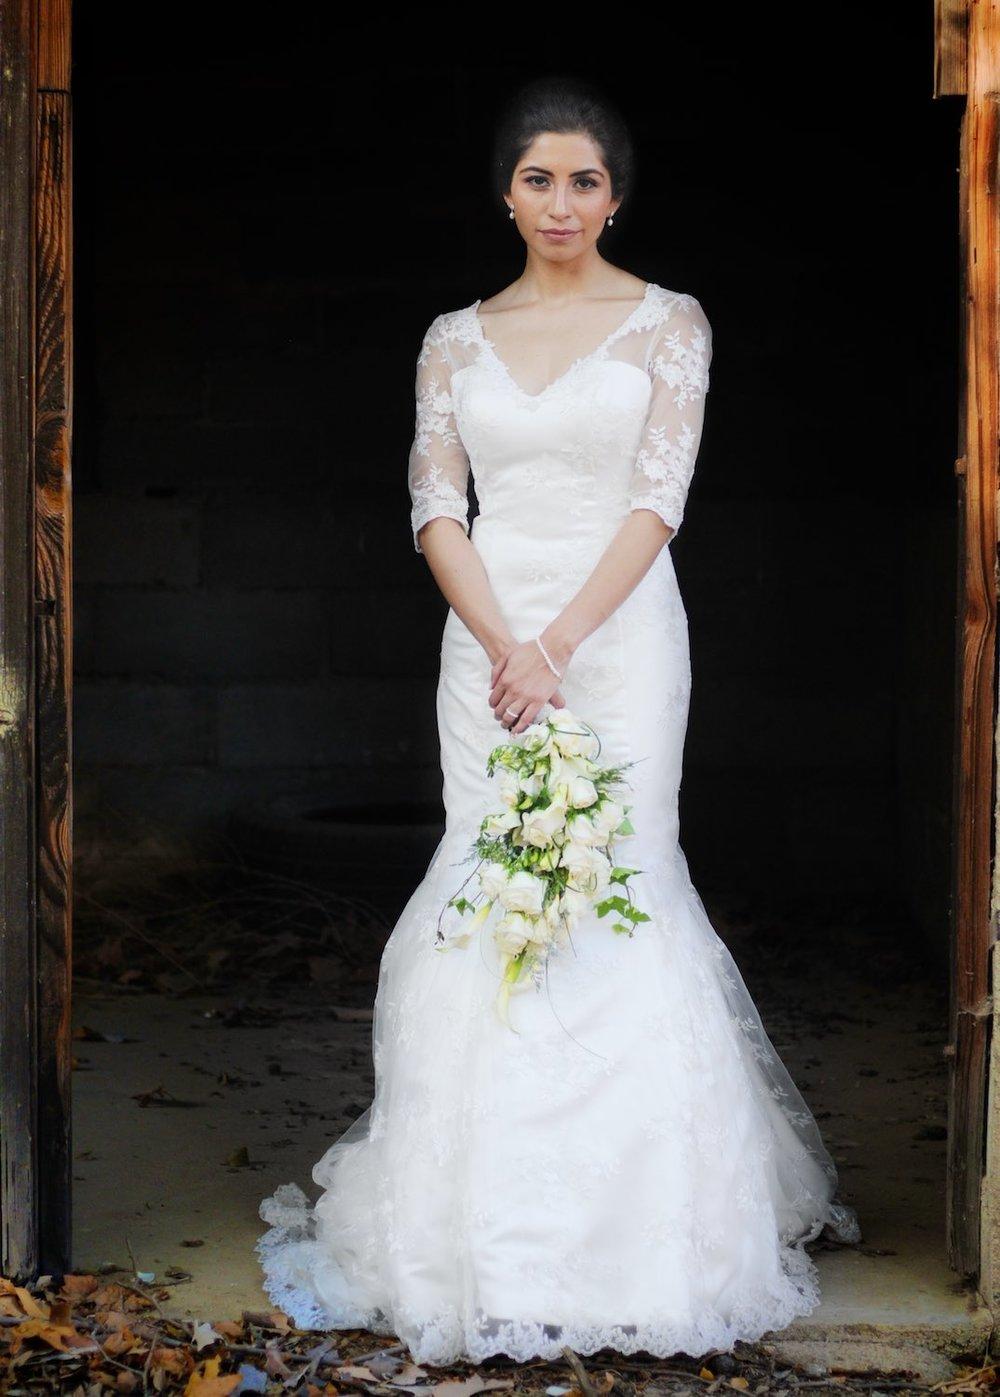 oc-wedding-michal-pfeil-06.jpg